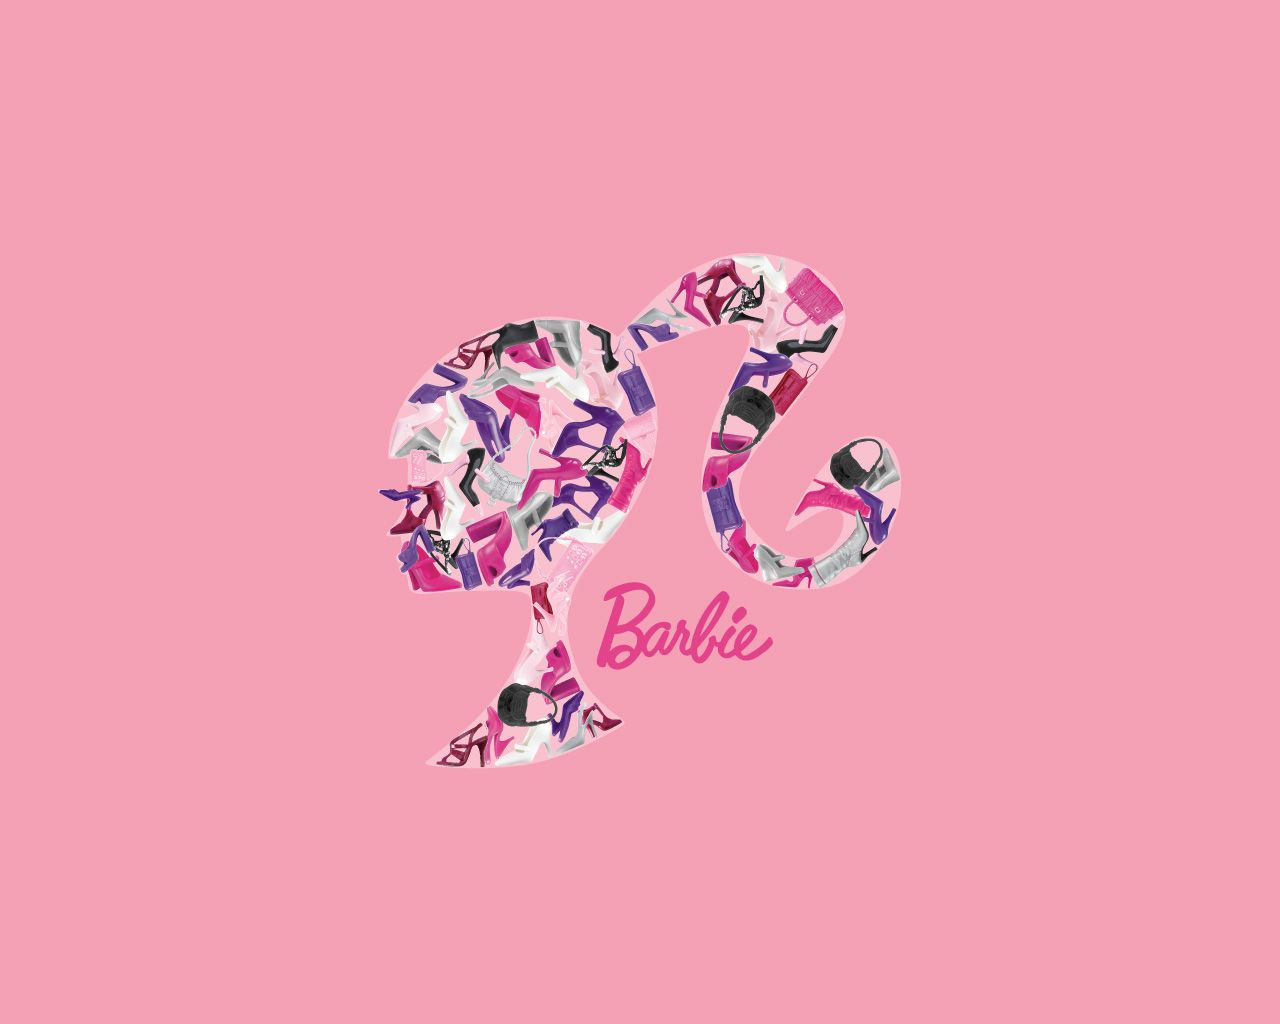 Barbie wallpaper barbie pinterest barbie wallpaper voltagebd Choice Image